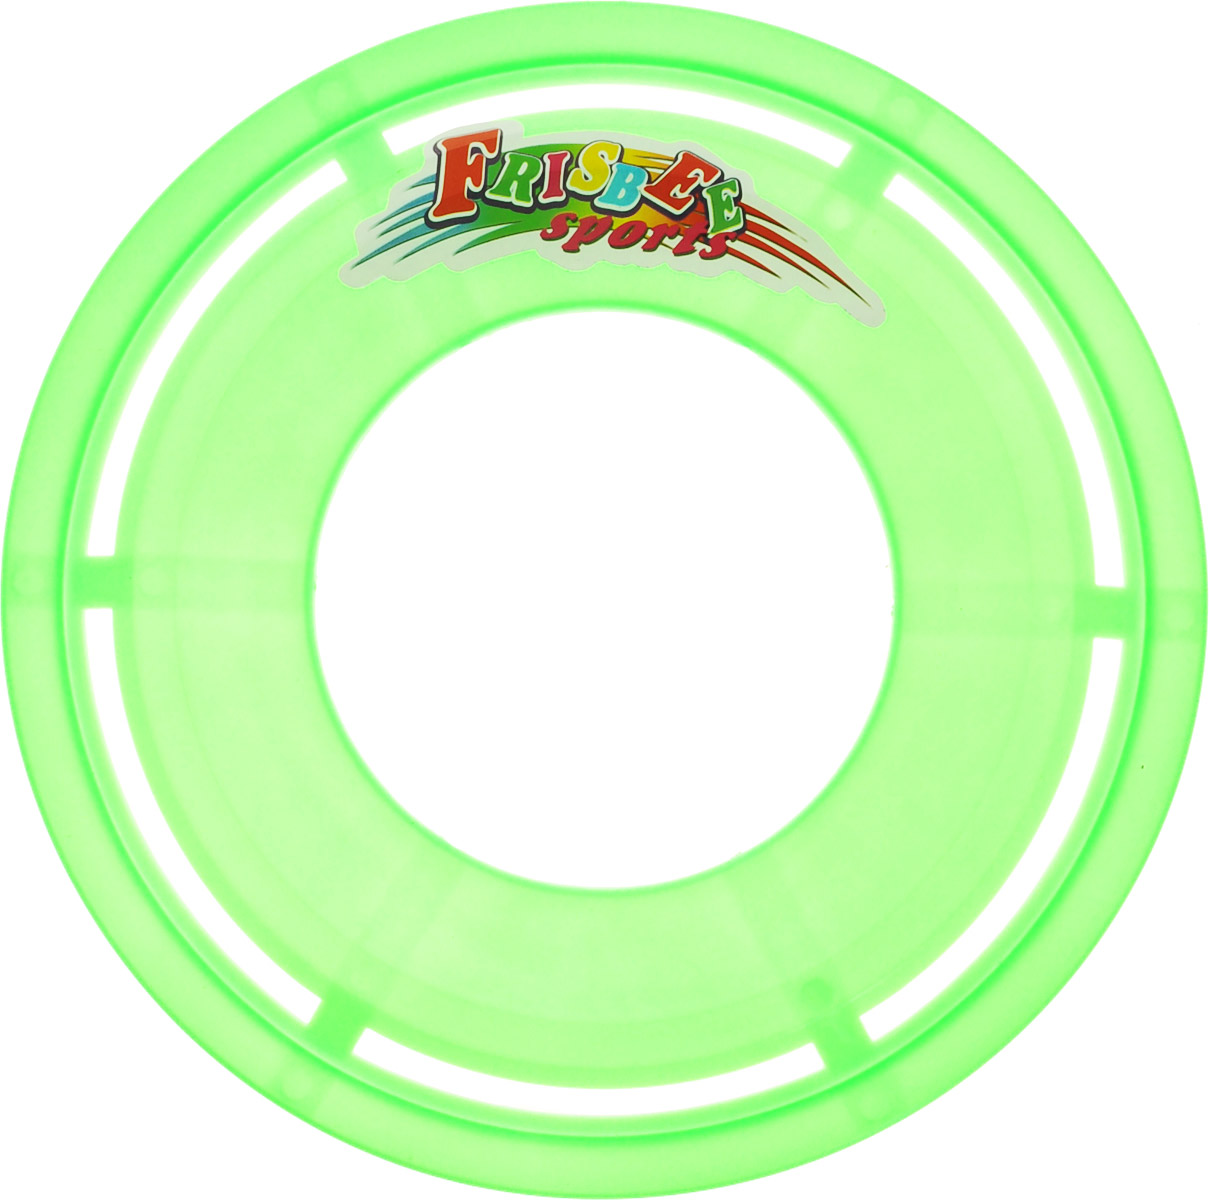 Veld-Co Летающая тарелка цвет зеленый диаметр 23 см